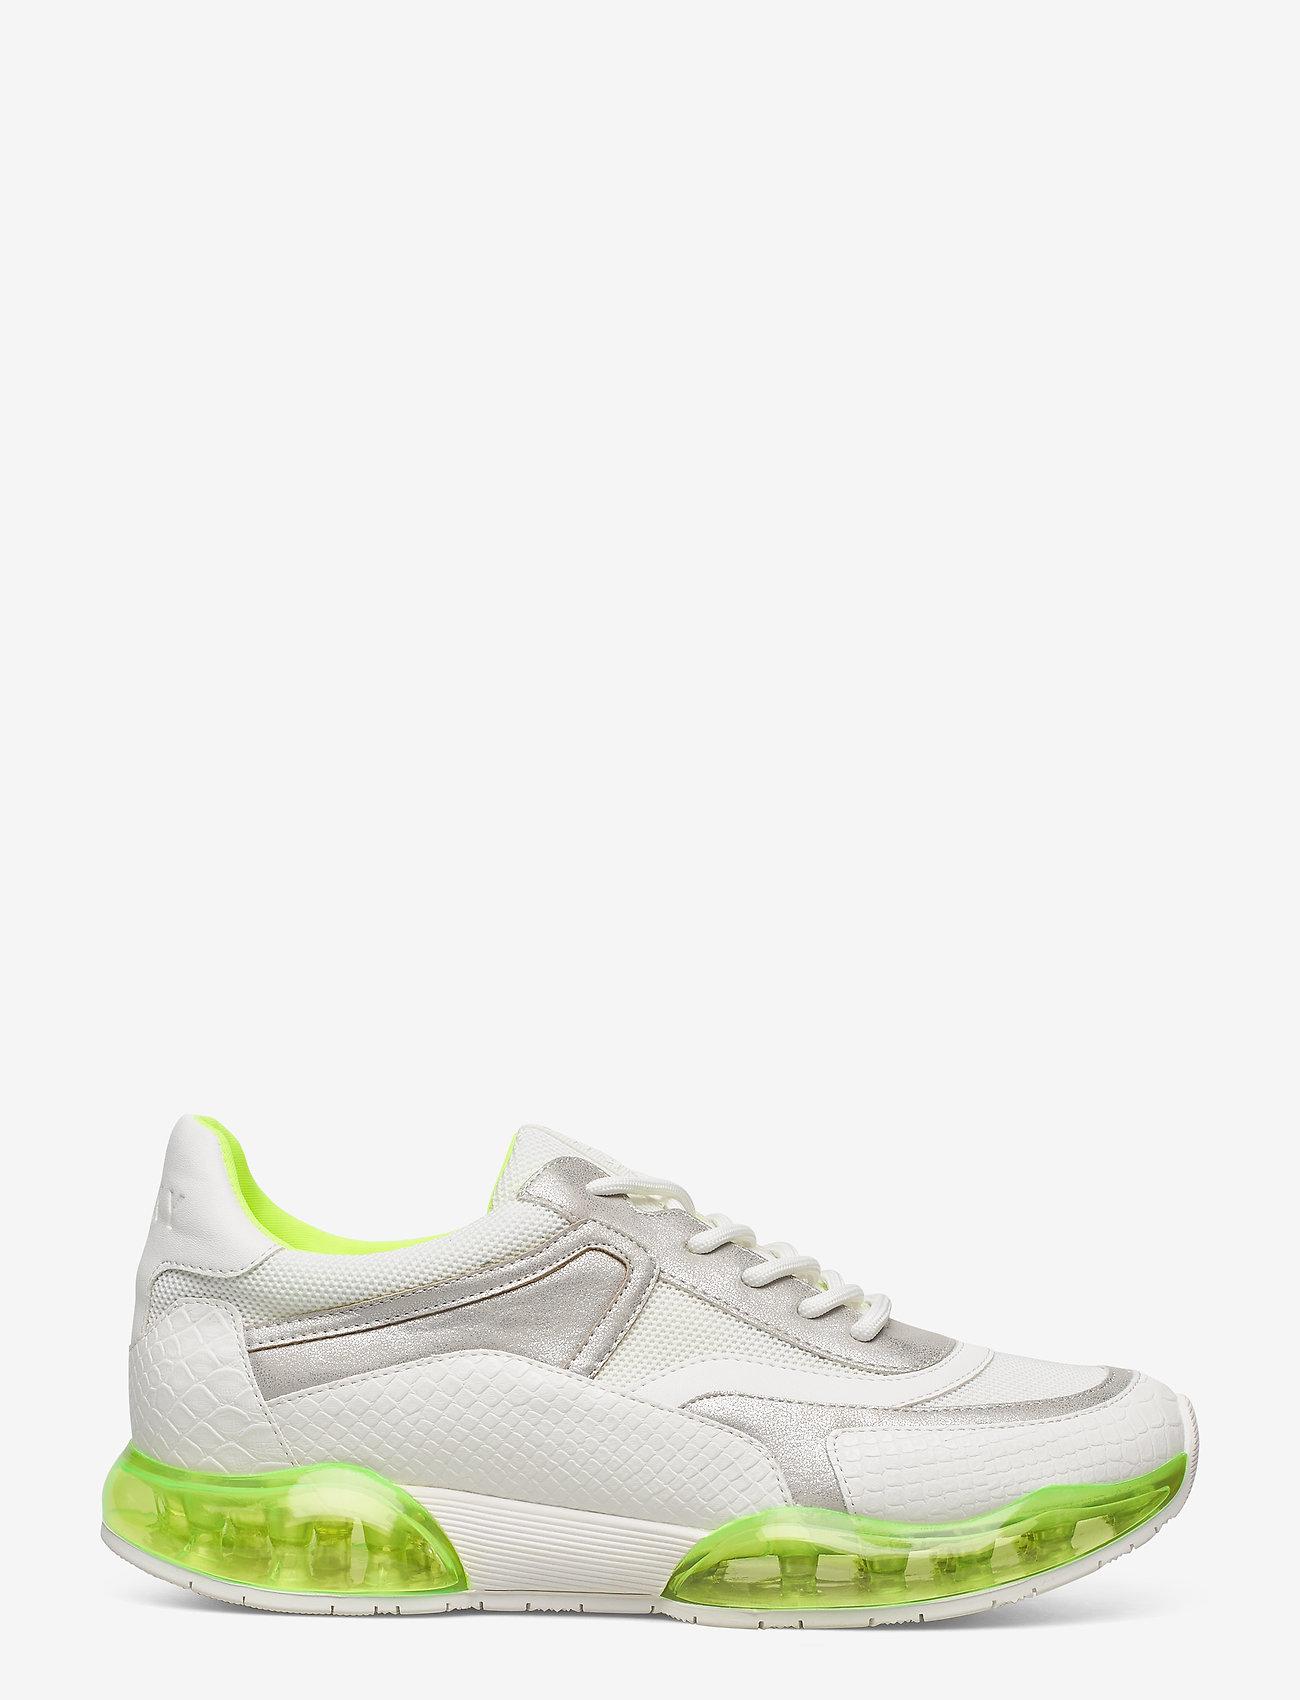 DKNY BLAKE - Sneakers WHITE